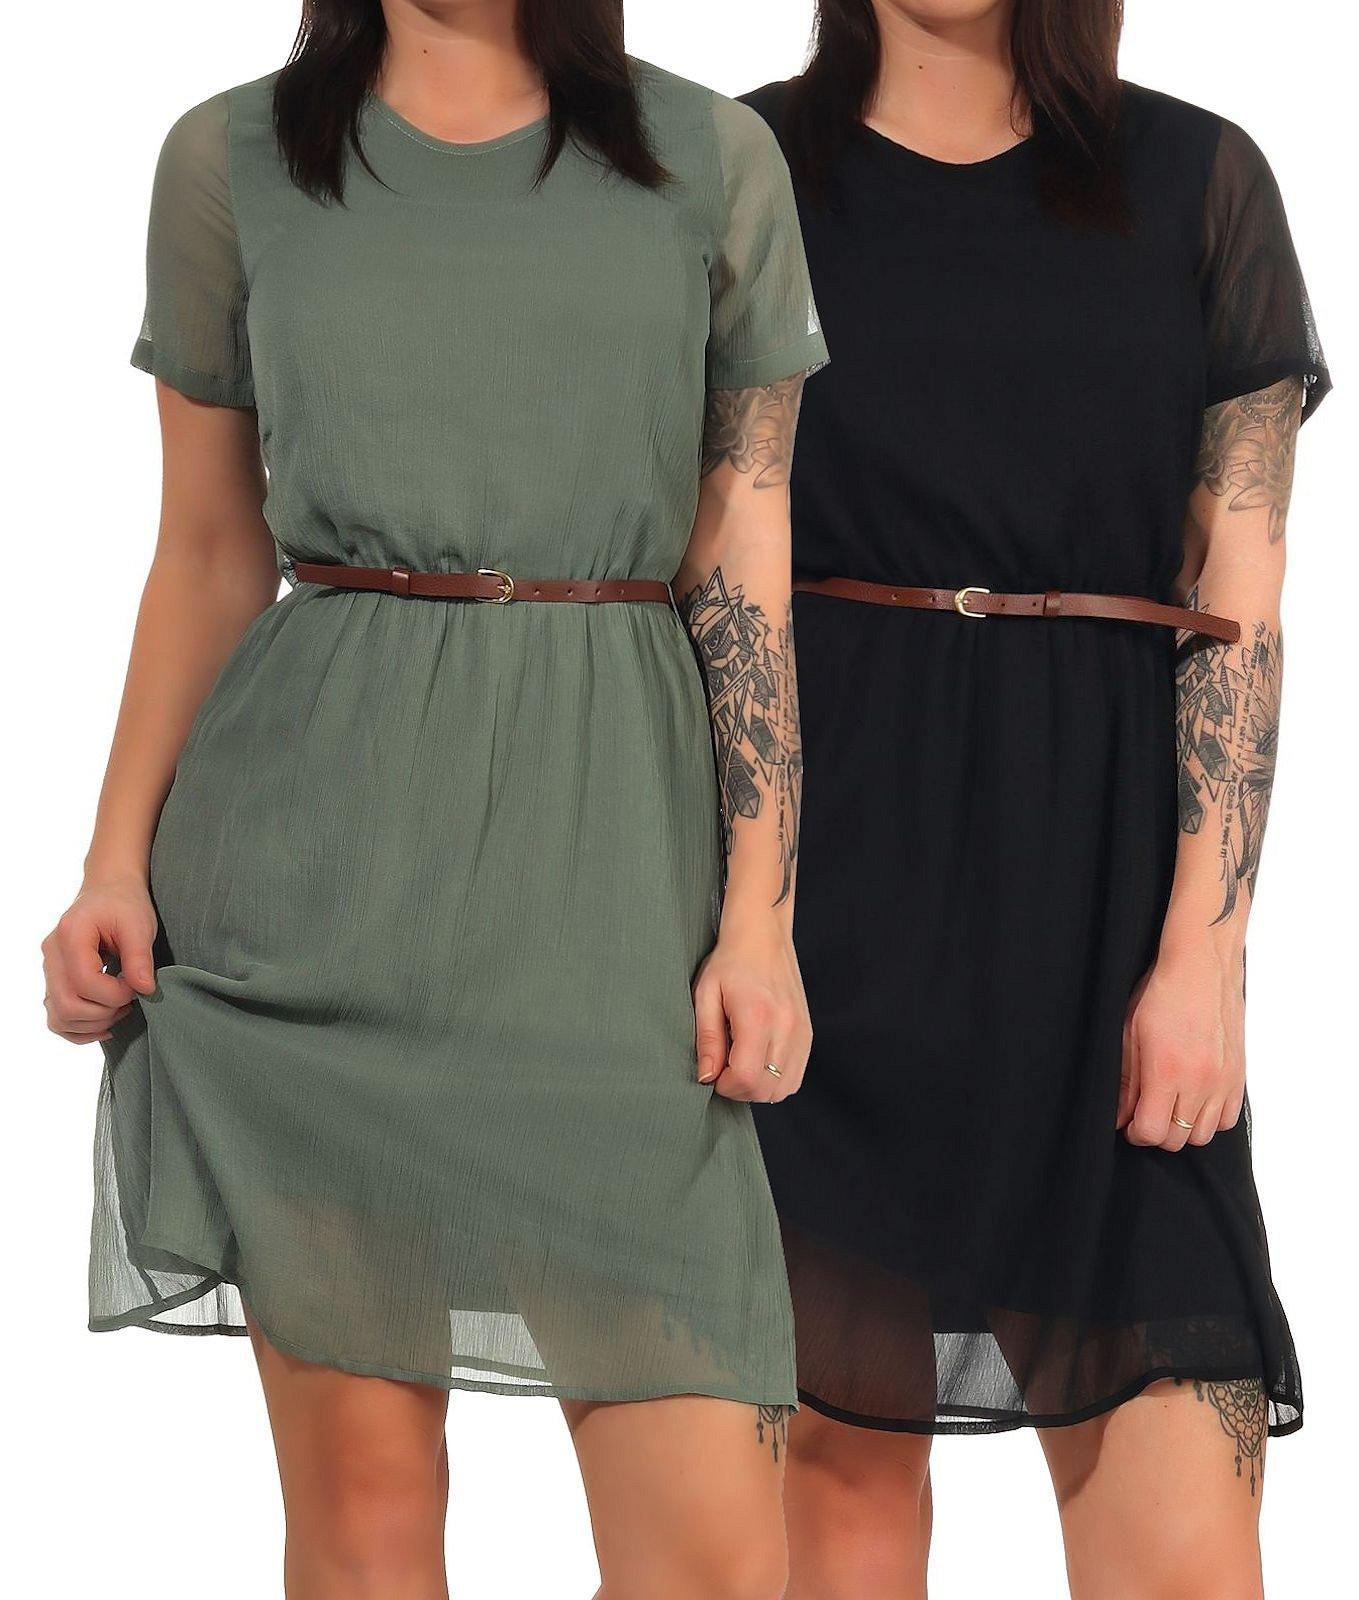 damen kleid damenkleid minikleid abendkleid cocktailkleid